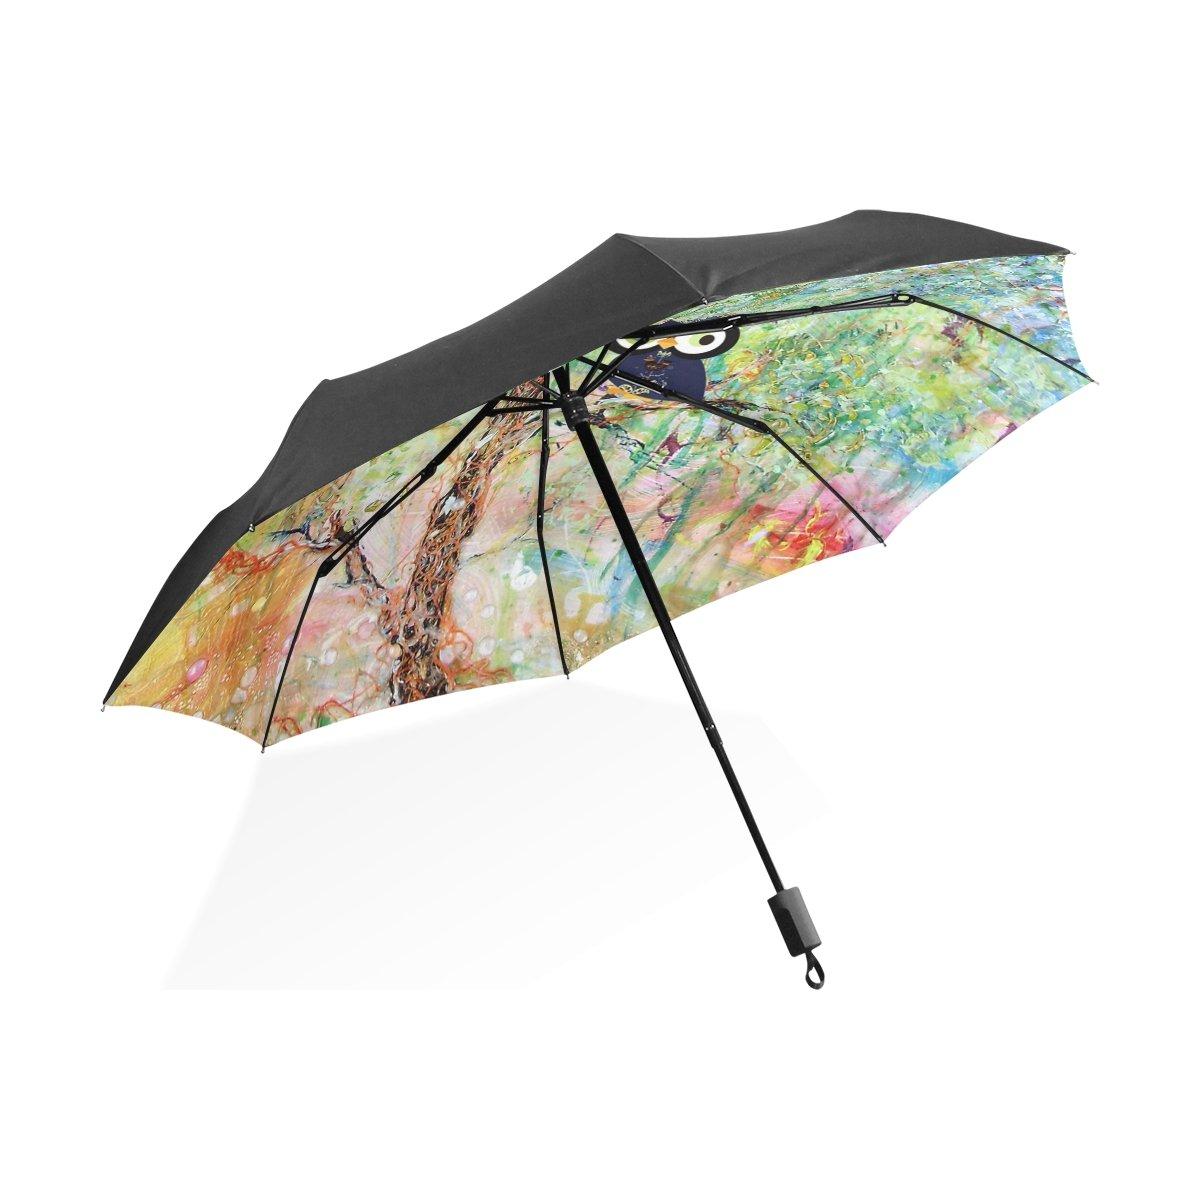 leisisiポータブルコンパクト折りたたみ傘防風UV保護傘 B076J8X5Y8 Umbrella-3 Umbrella-3